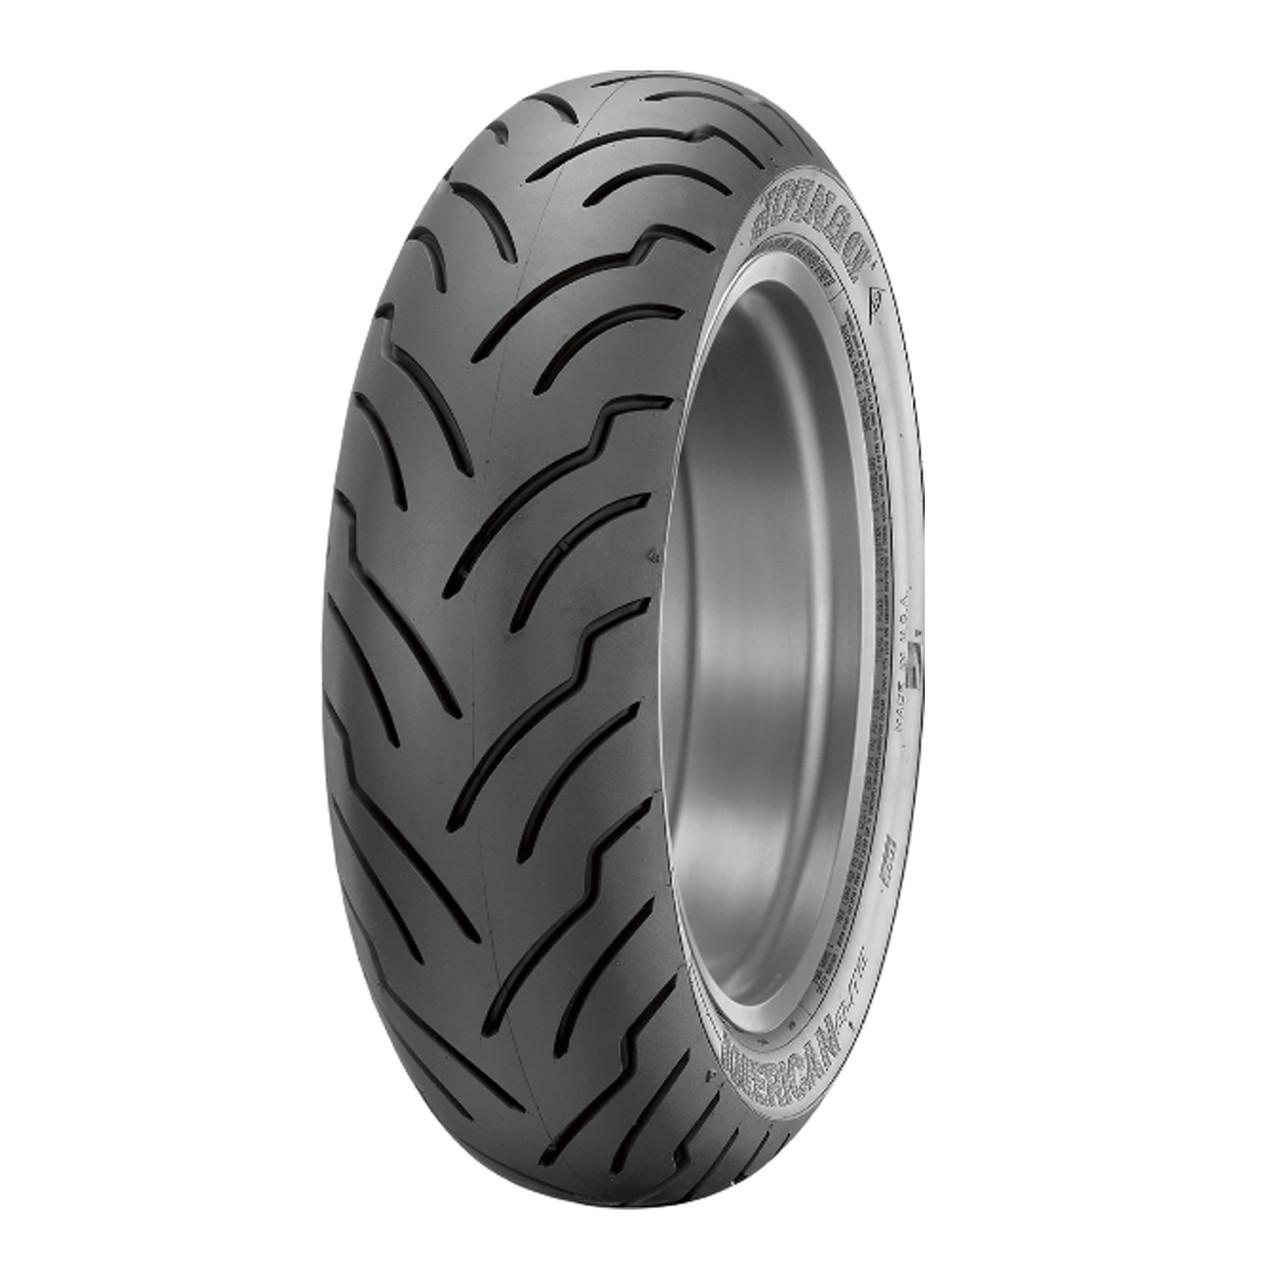 180/65-16 Dunlop American Elite Tires